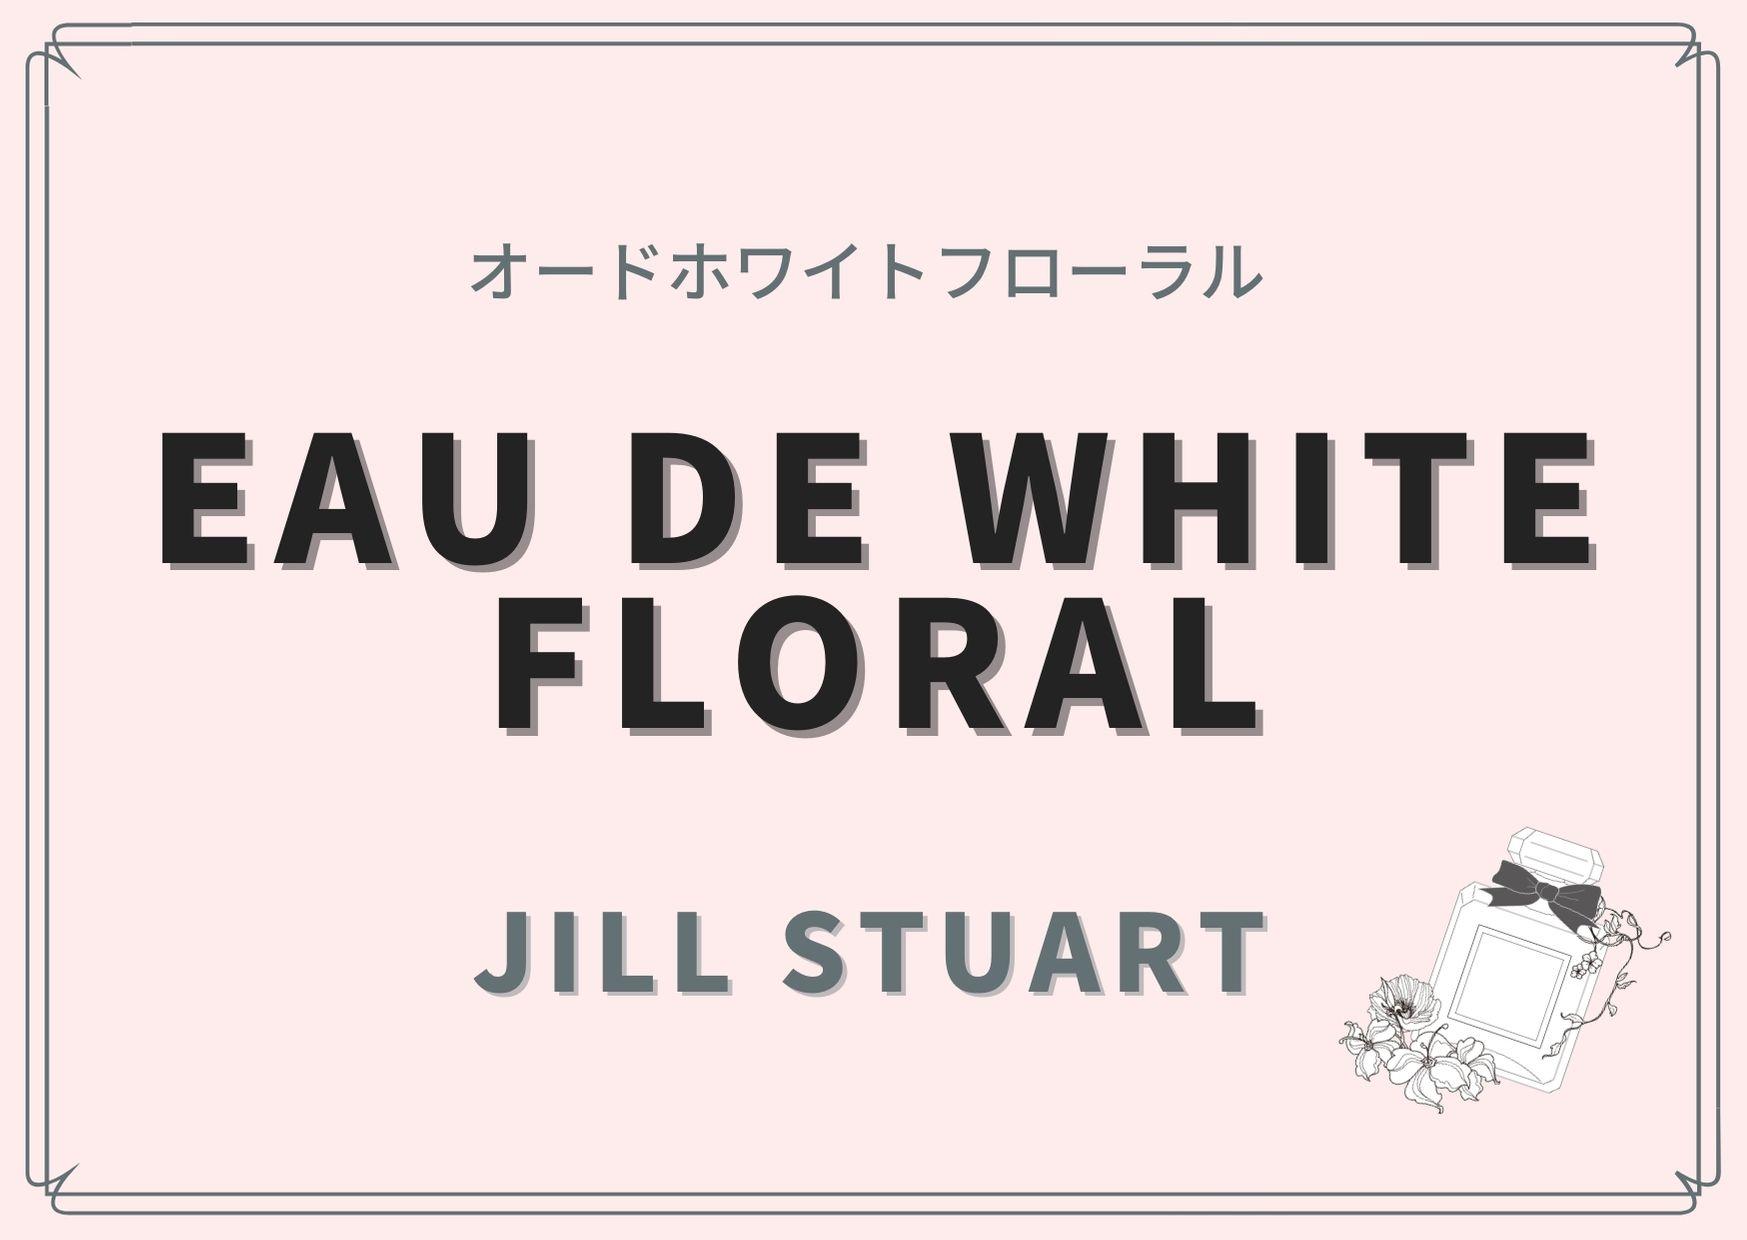 EAU DE WHITE FLORAL(オードホワイトフローラル )/JILL STUART(ジル スチュアート)